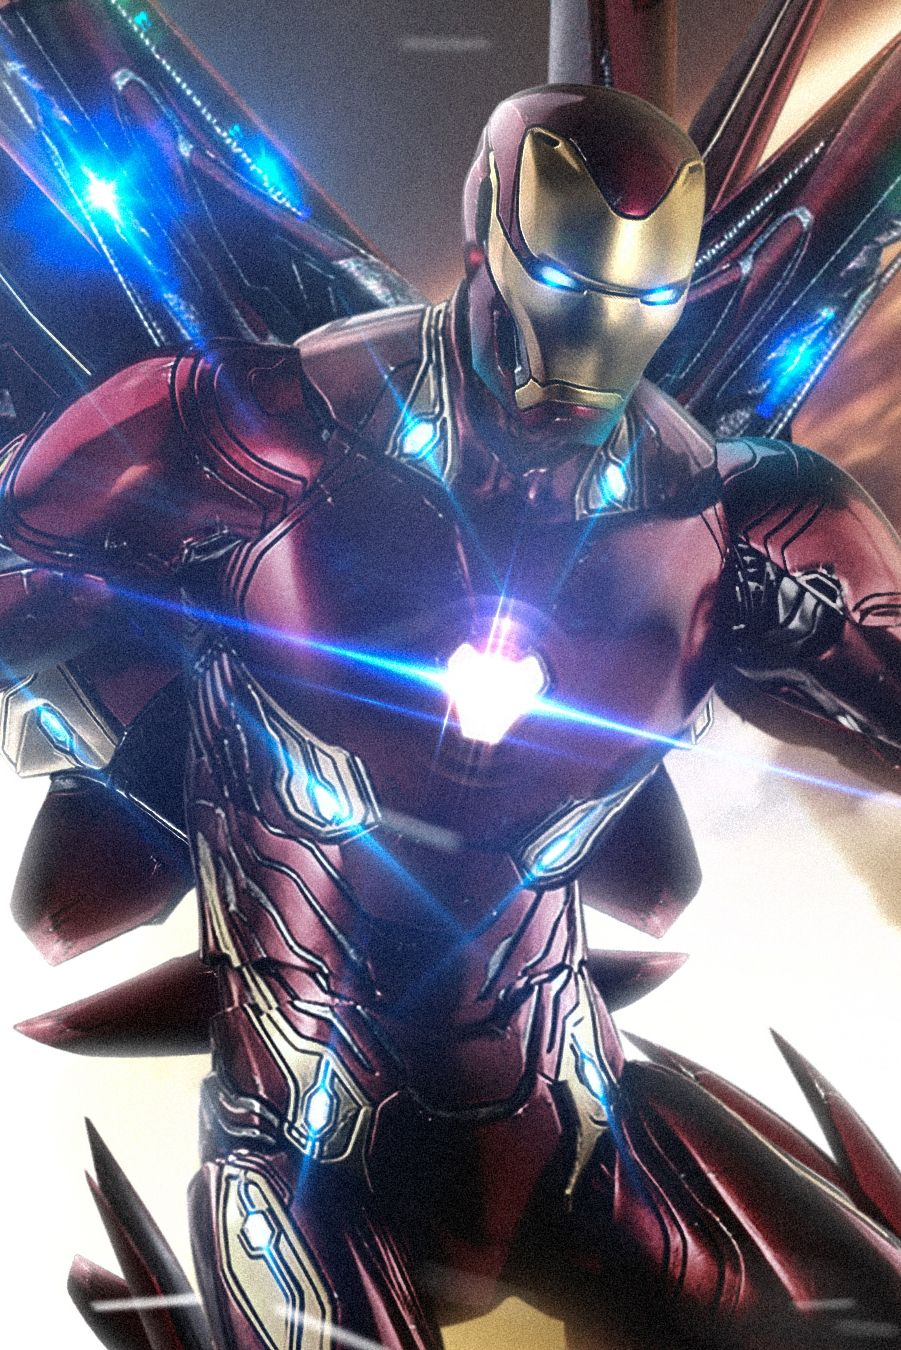 +20 Movies Wallpaper in 2020 Iron man wallpaper, Iron